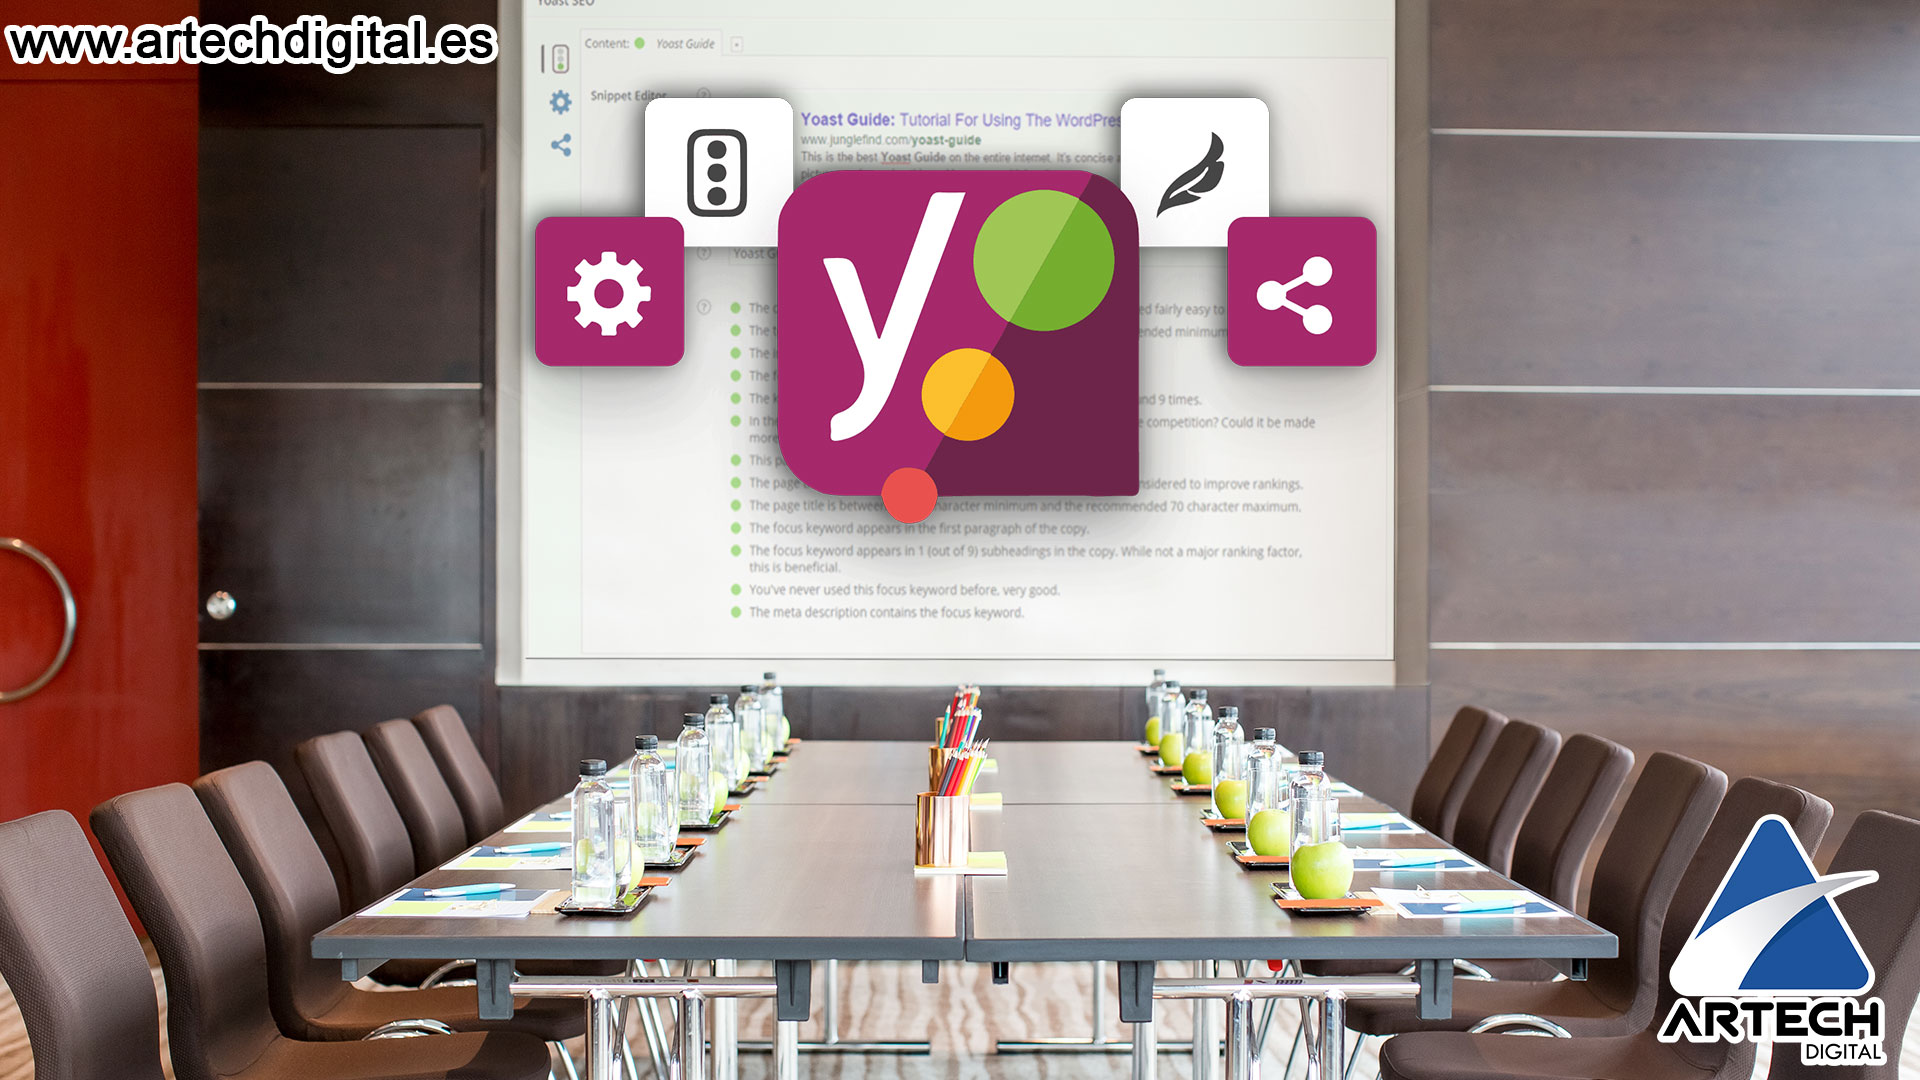 Aprende-utilizar-análisis-legibilidad-Yoast-SEO-Plugin - Artech Digital